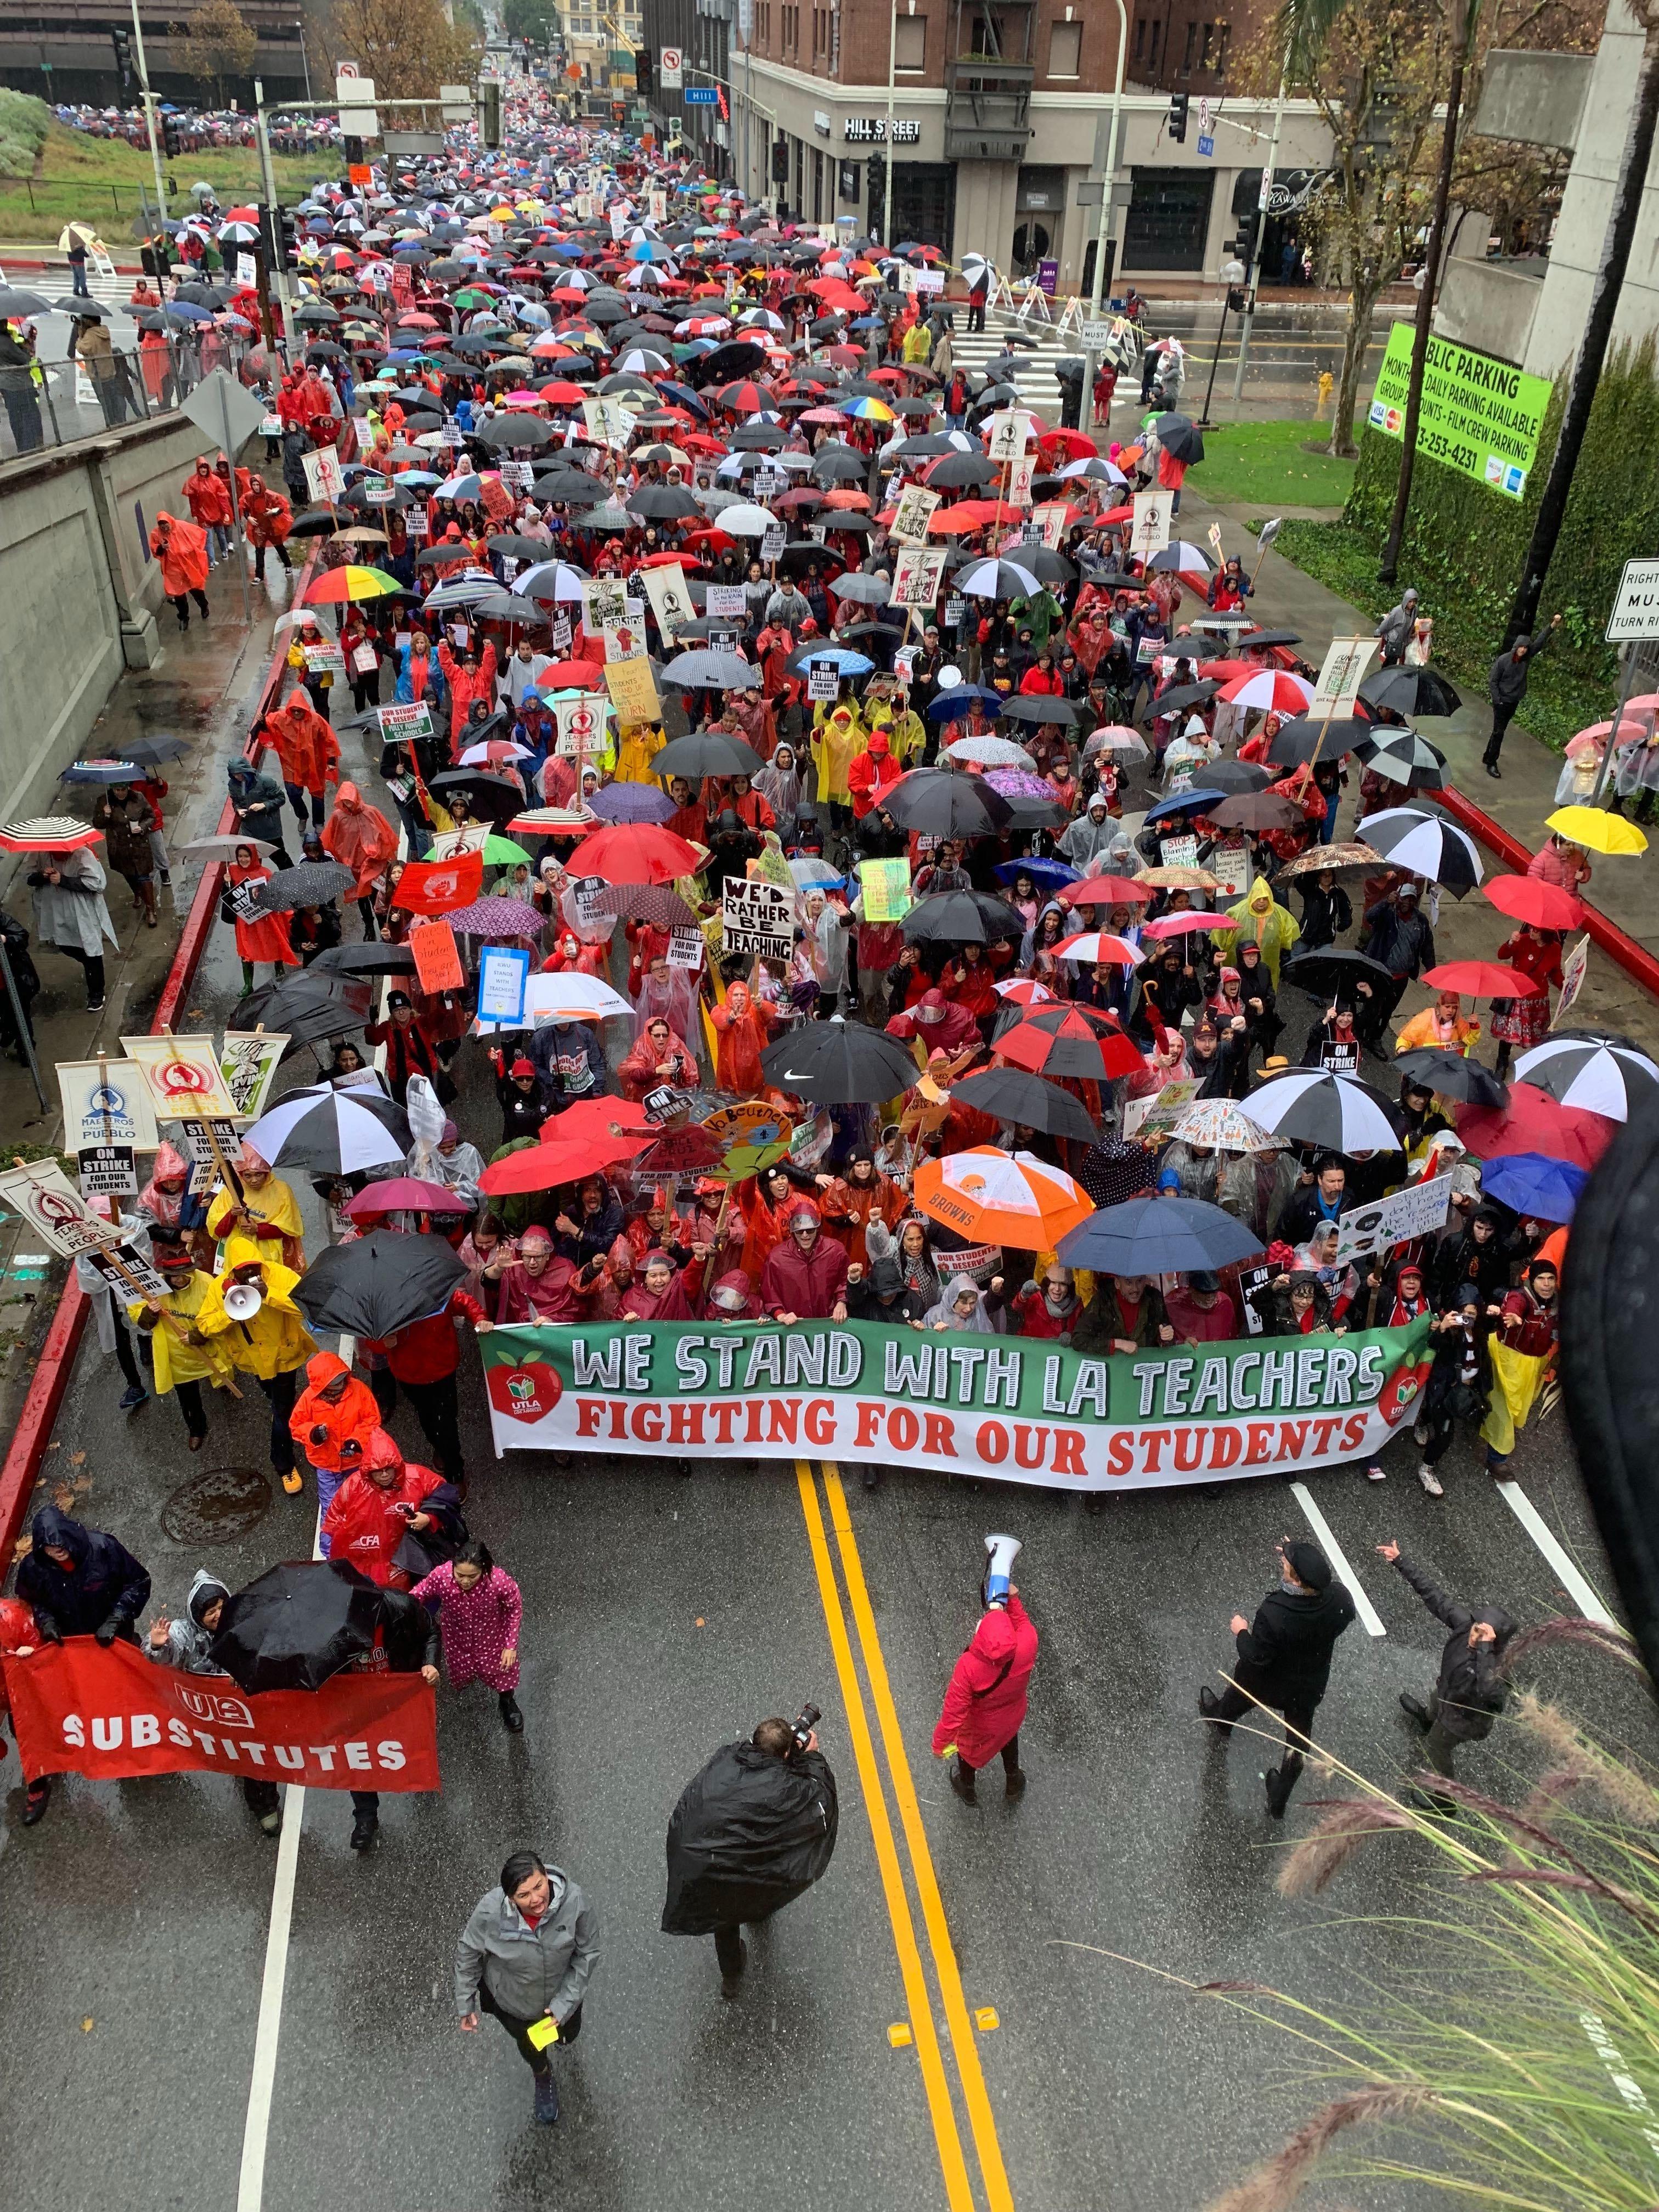 Los Angeles teachers end week-long strike after reaching 'historic agreement'